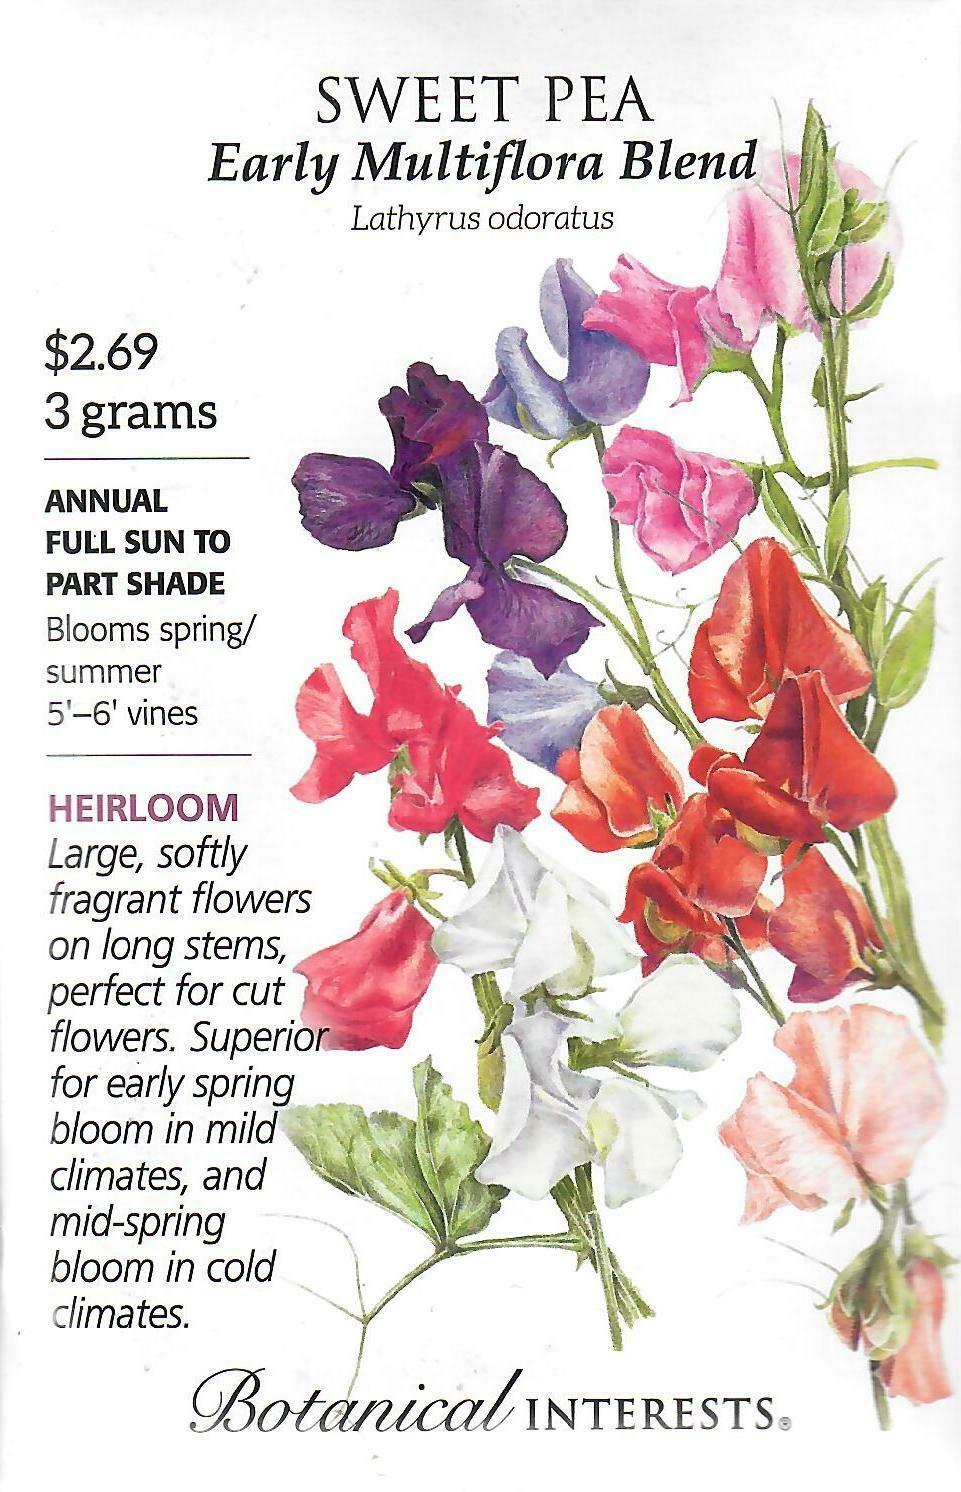 Sweet Pea Early Multiflora Blend Botanical Interests